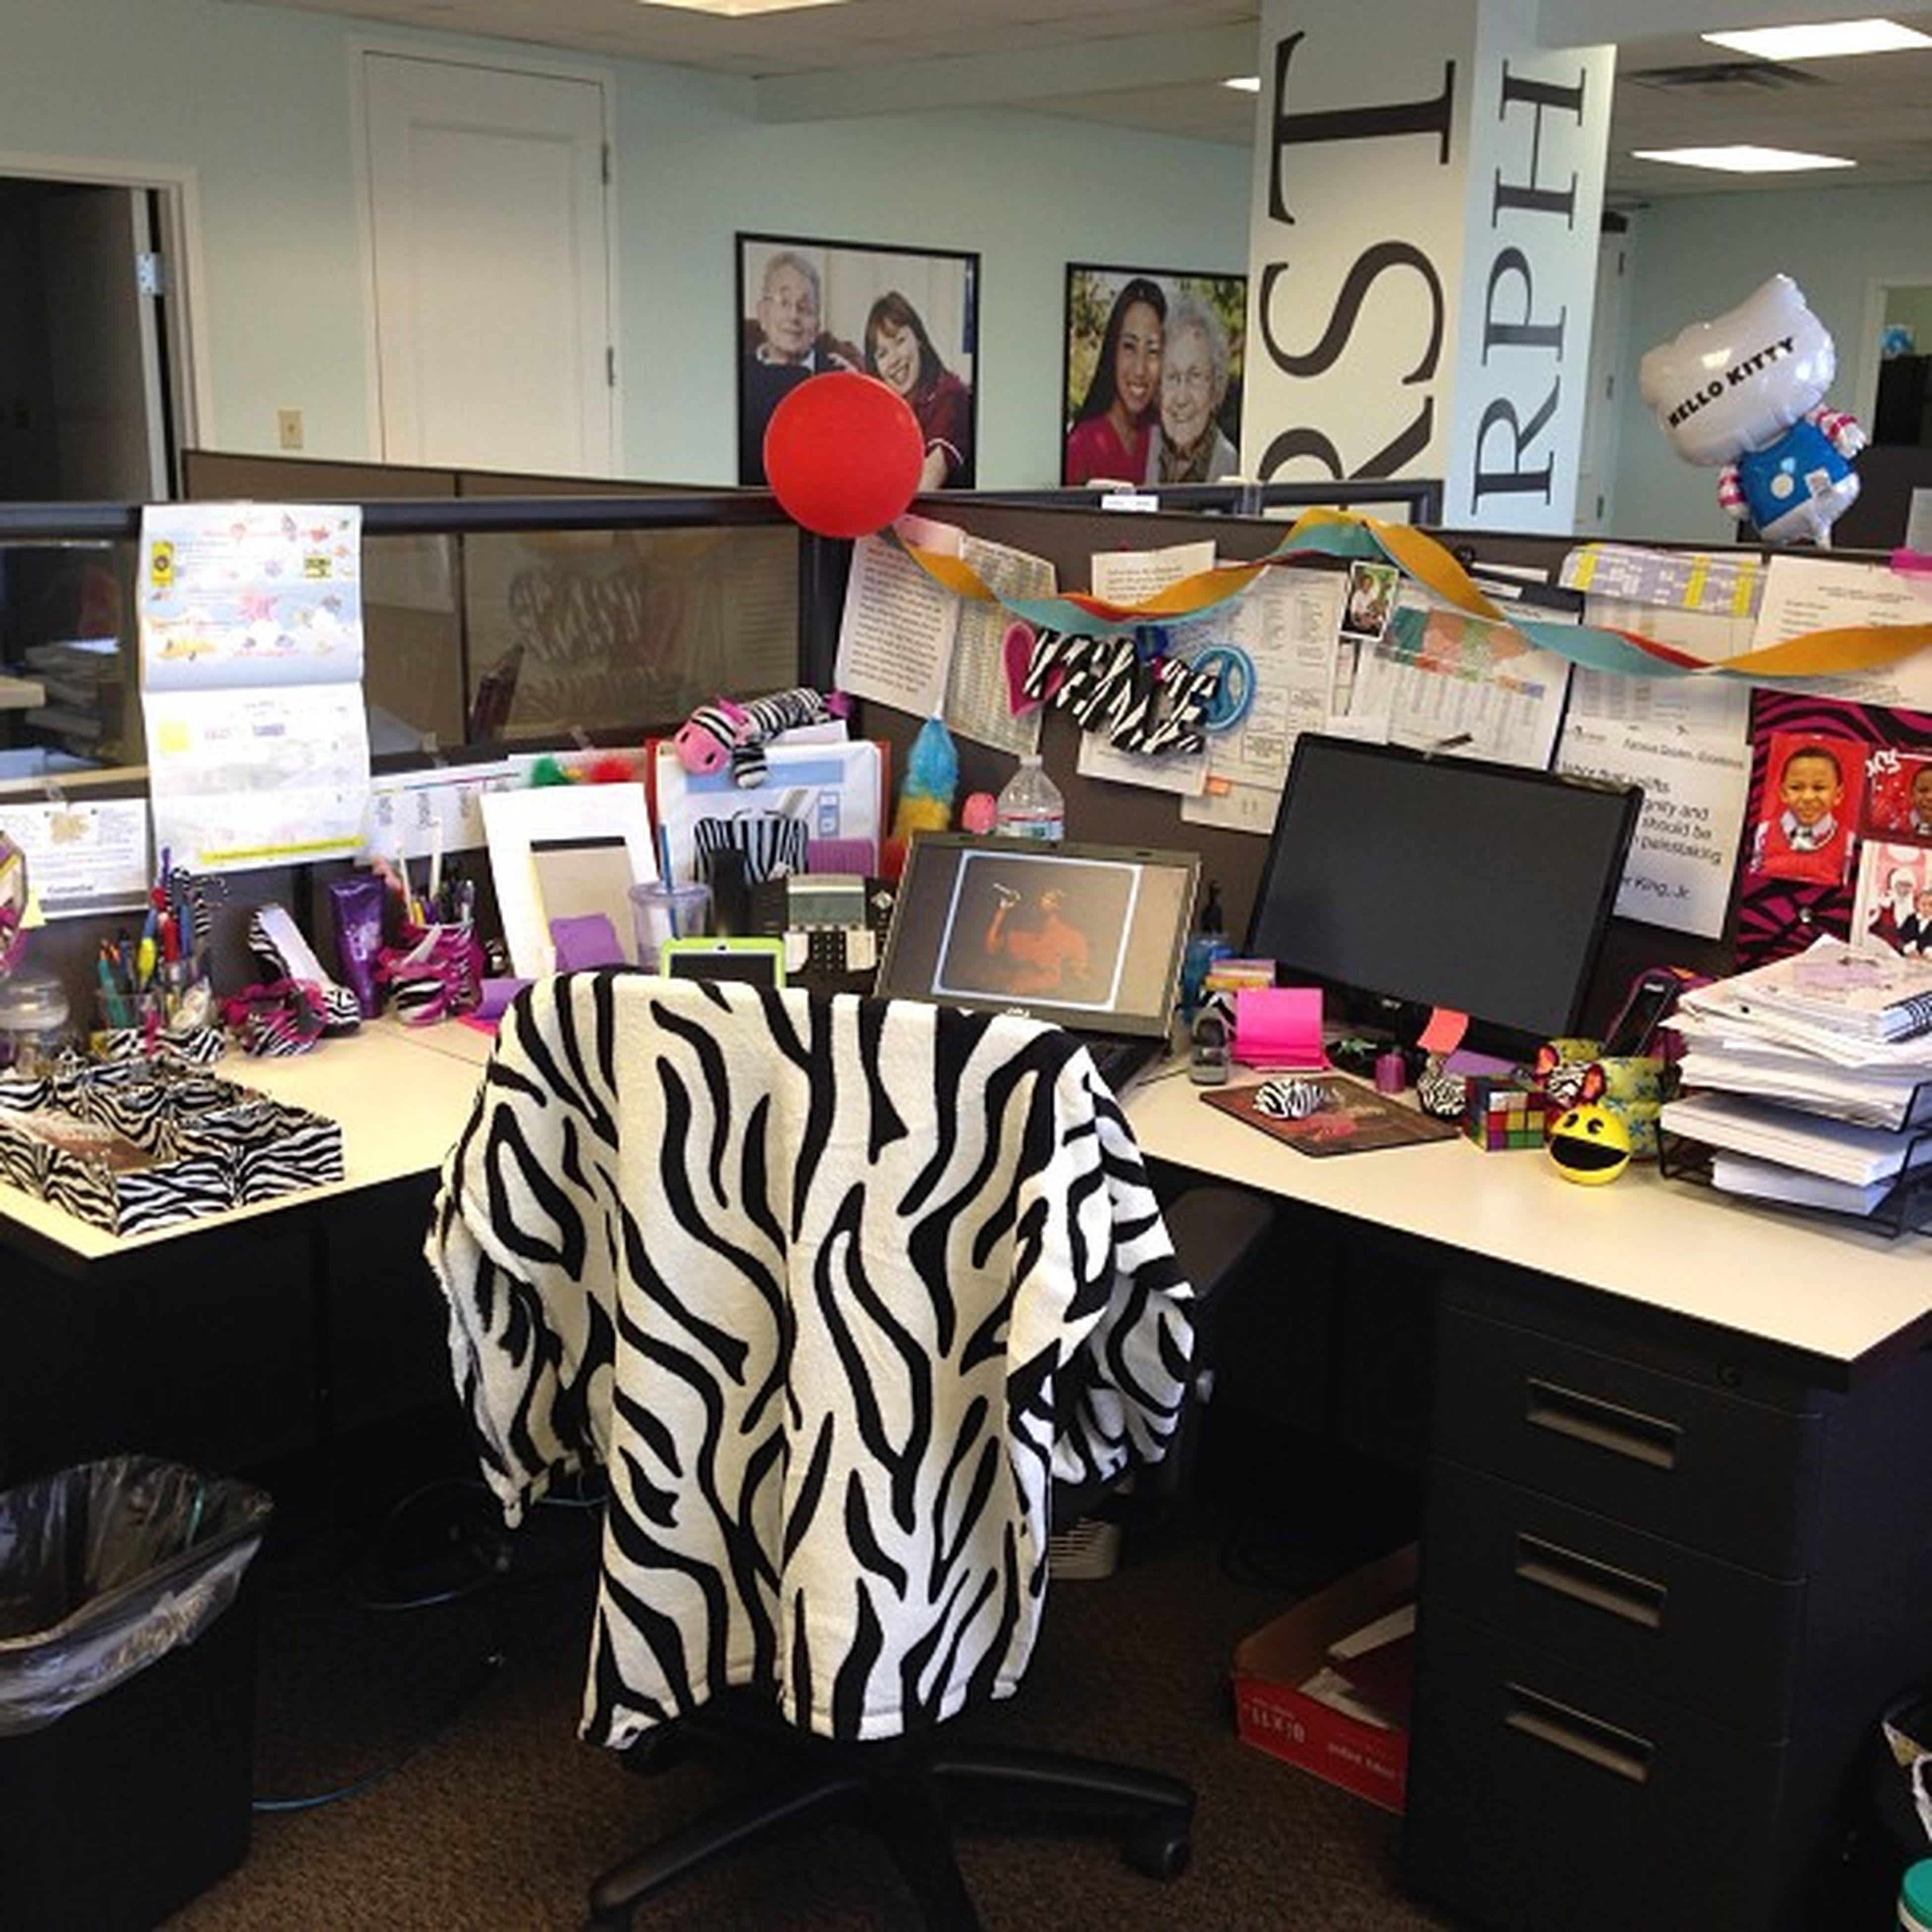 I love zebra